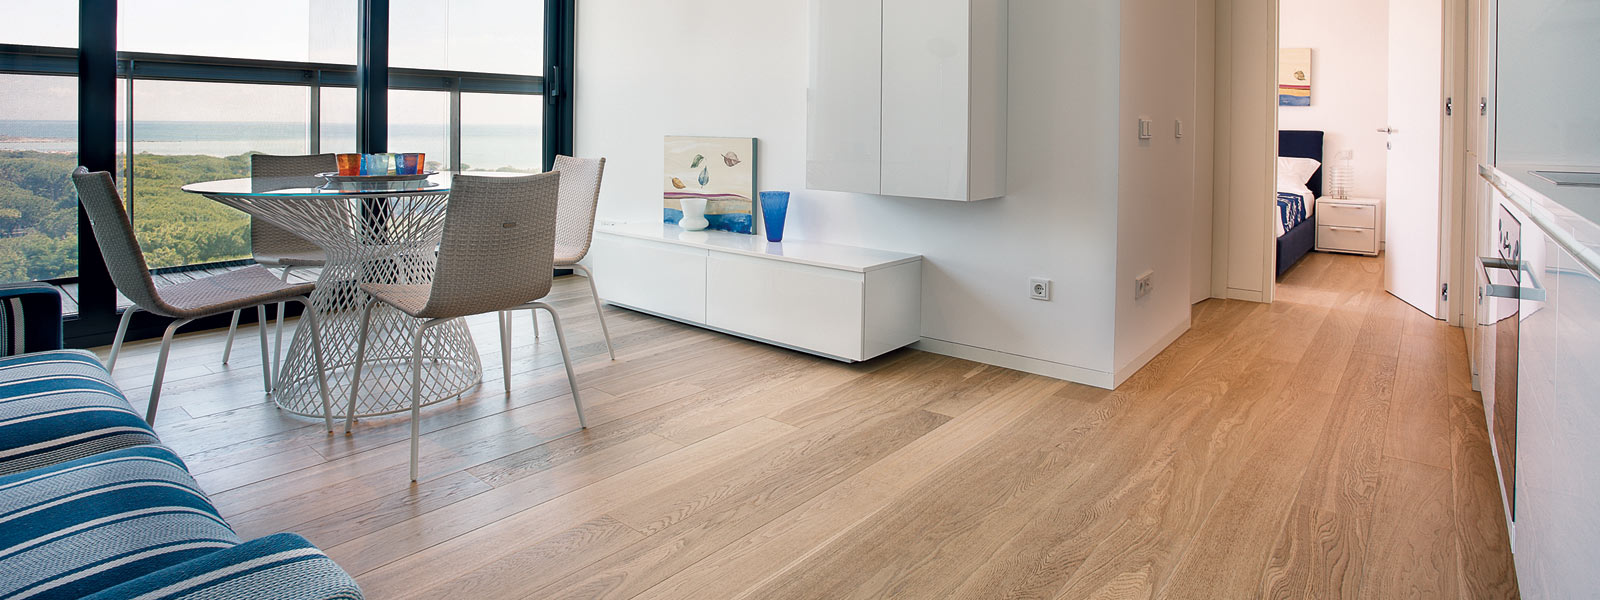 parquet and wooden floor itlas